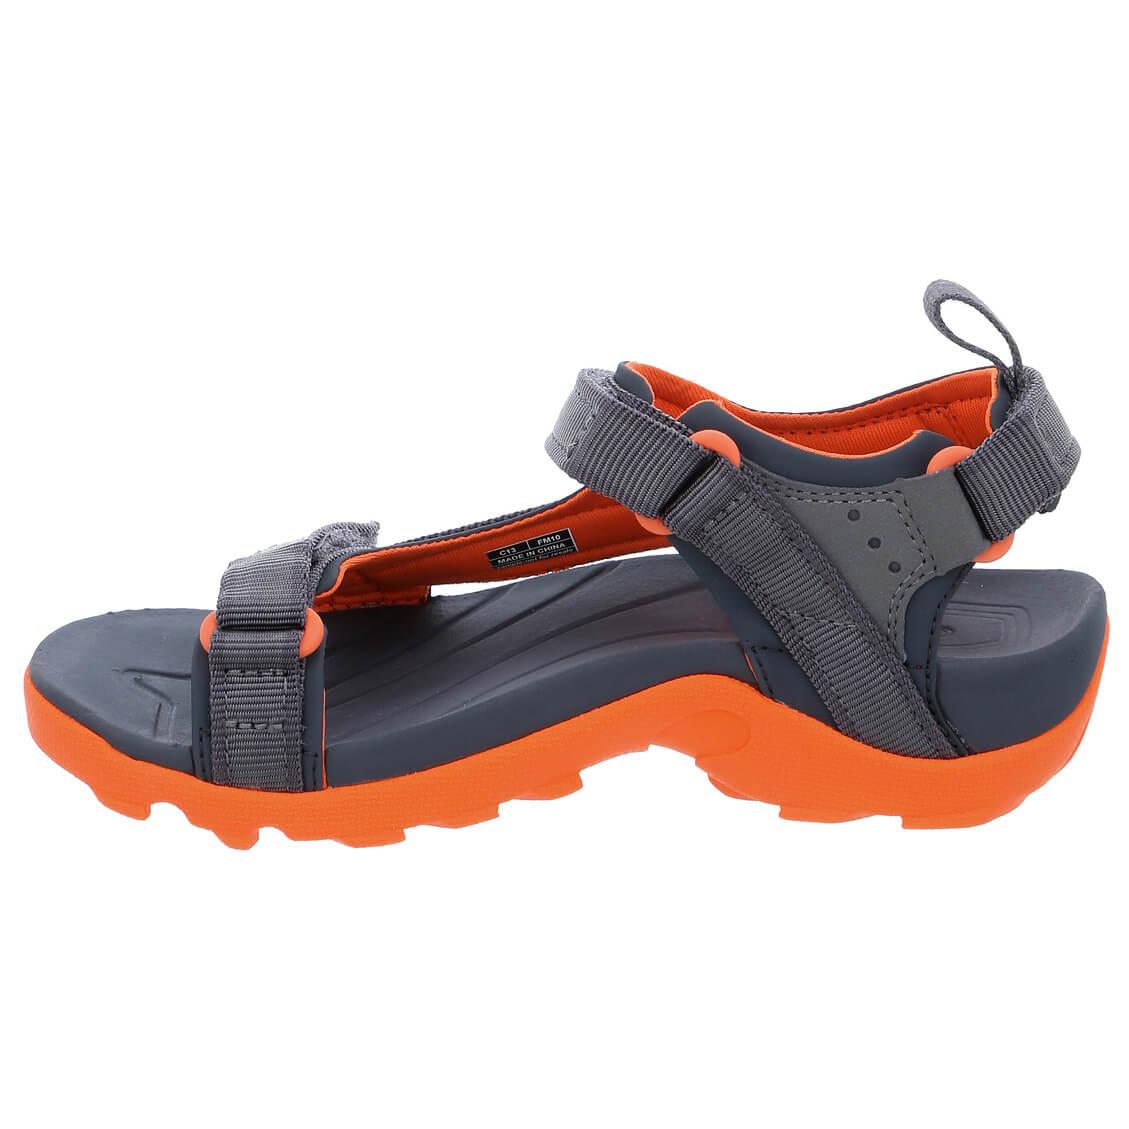 ea90d3872ce5 teva kinder sandalen Teva Tanza - Sandalen Kinder